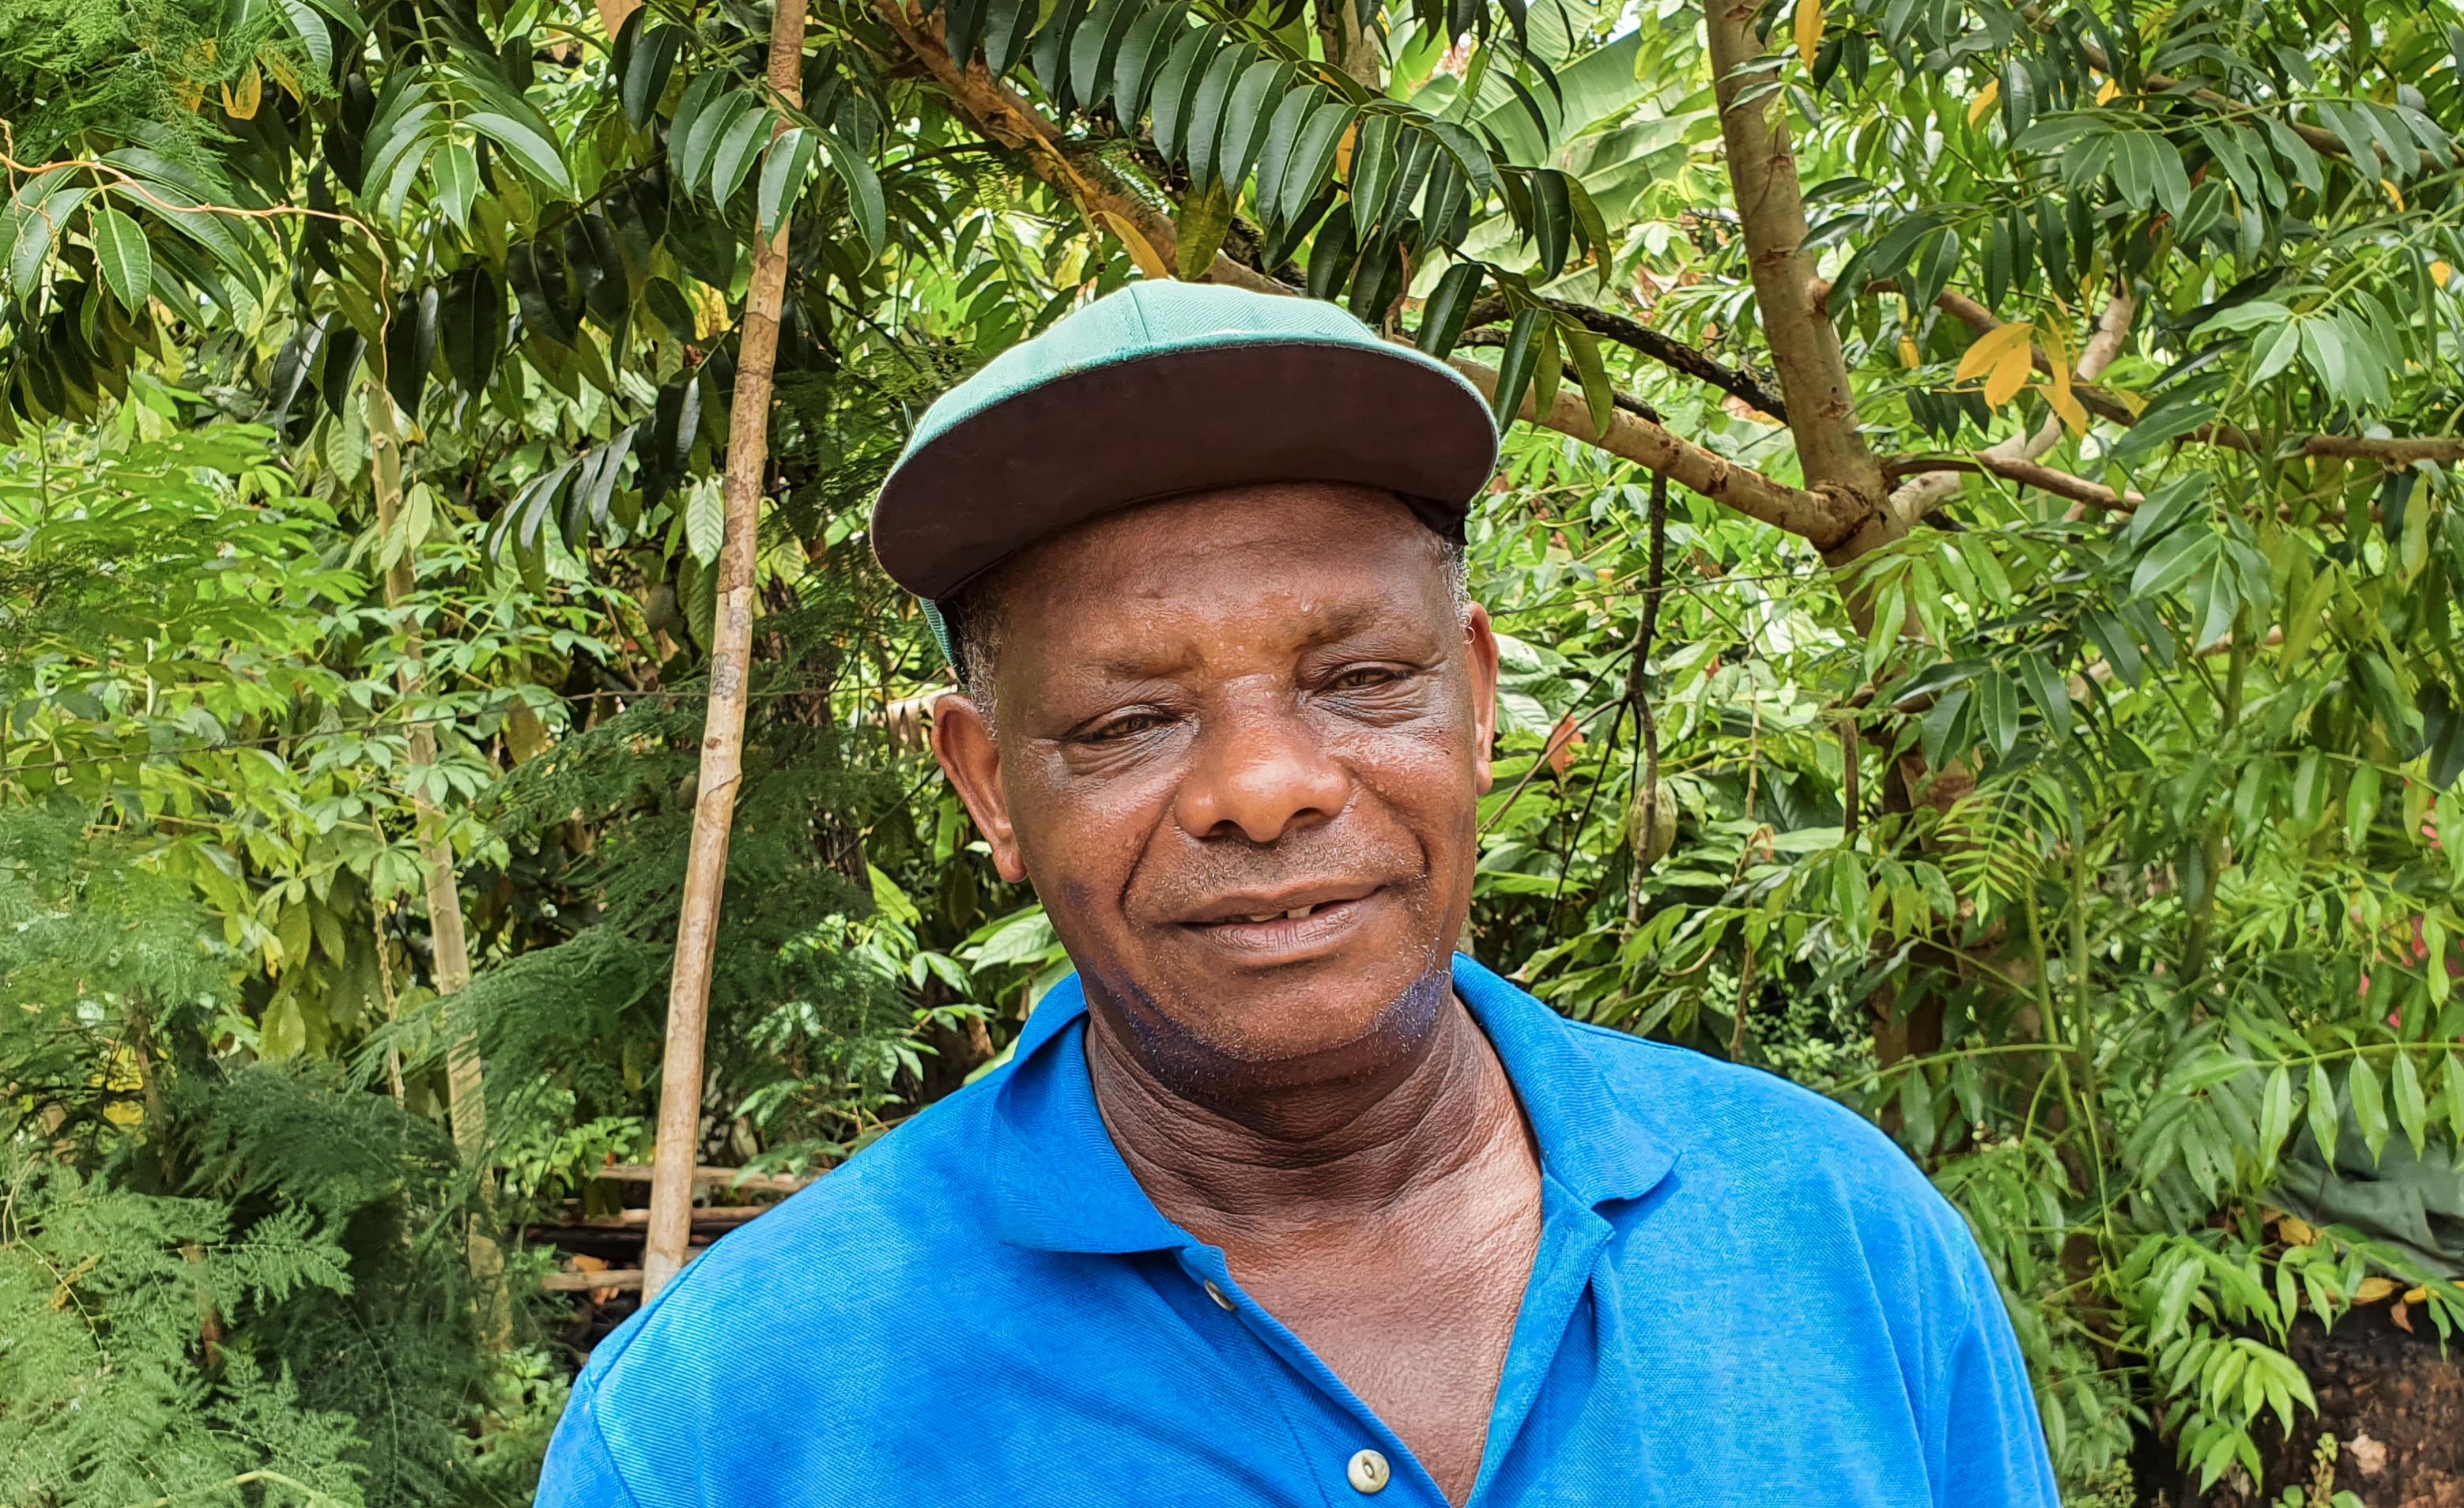 Mr. Juvenal on his organic cacao farm in Bahia Brazil Atlantic Rainforest